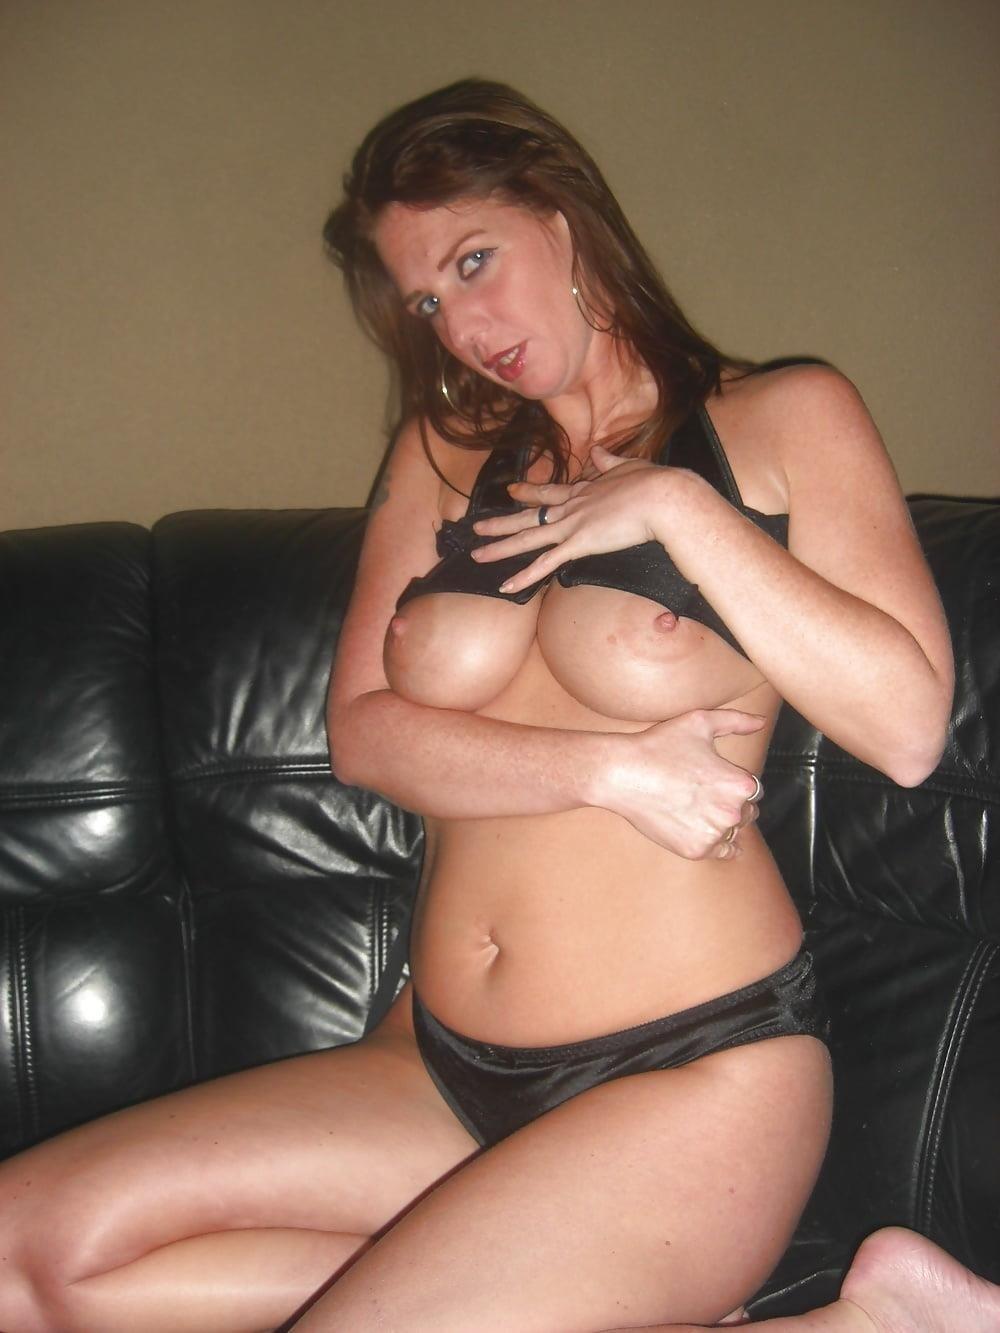 Big tit brunette pics-1470